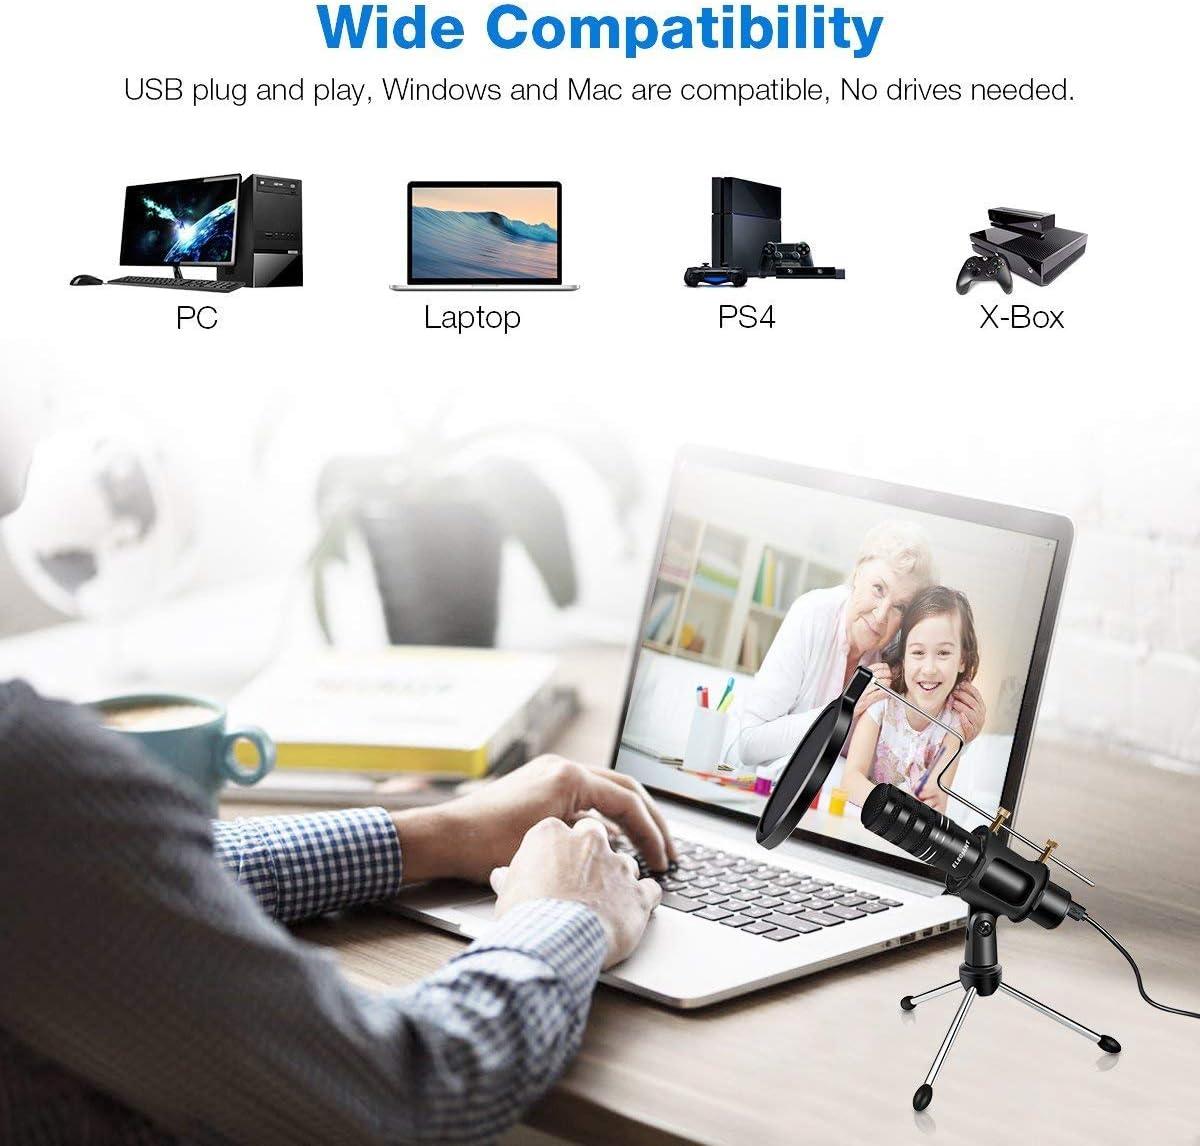 ONLT USB, micr/ófono omnidireccional, 360/°, audio de alta definici/ón, para conferencias, grabaciones, podcasting, transmisi/ón, canto, chates, ordenador de escritorio Micr/ófono de condensador para PC